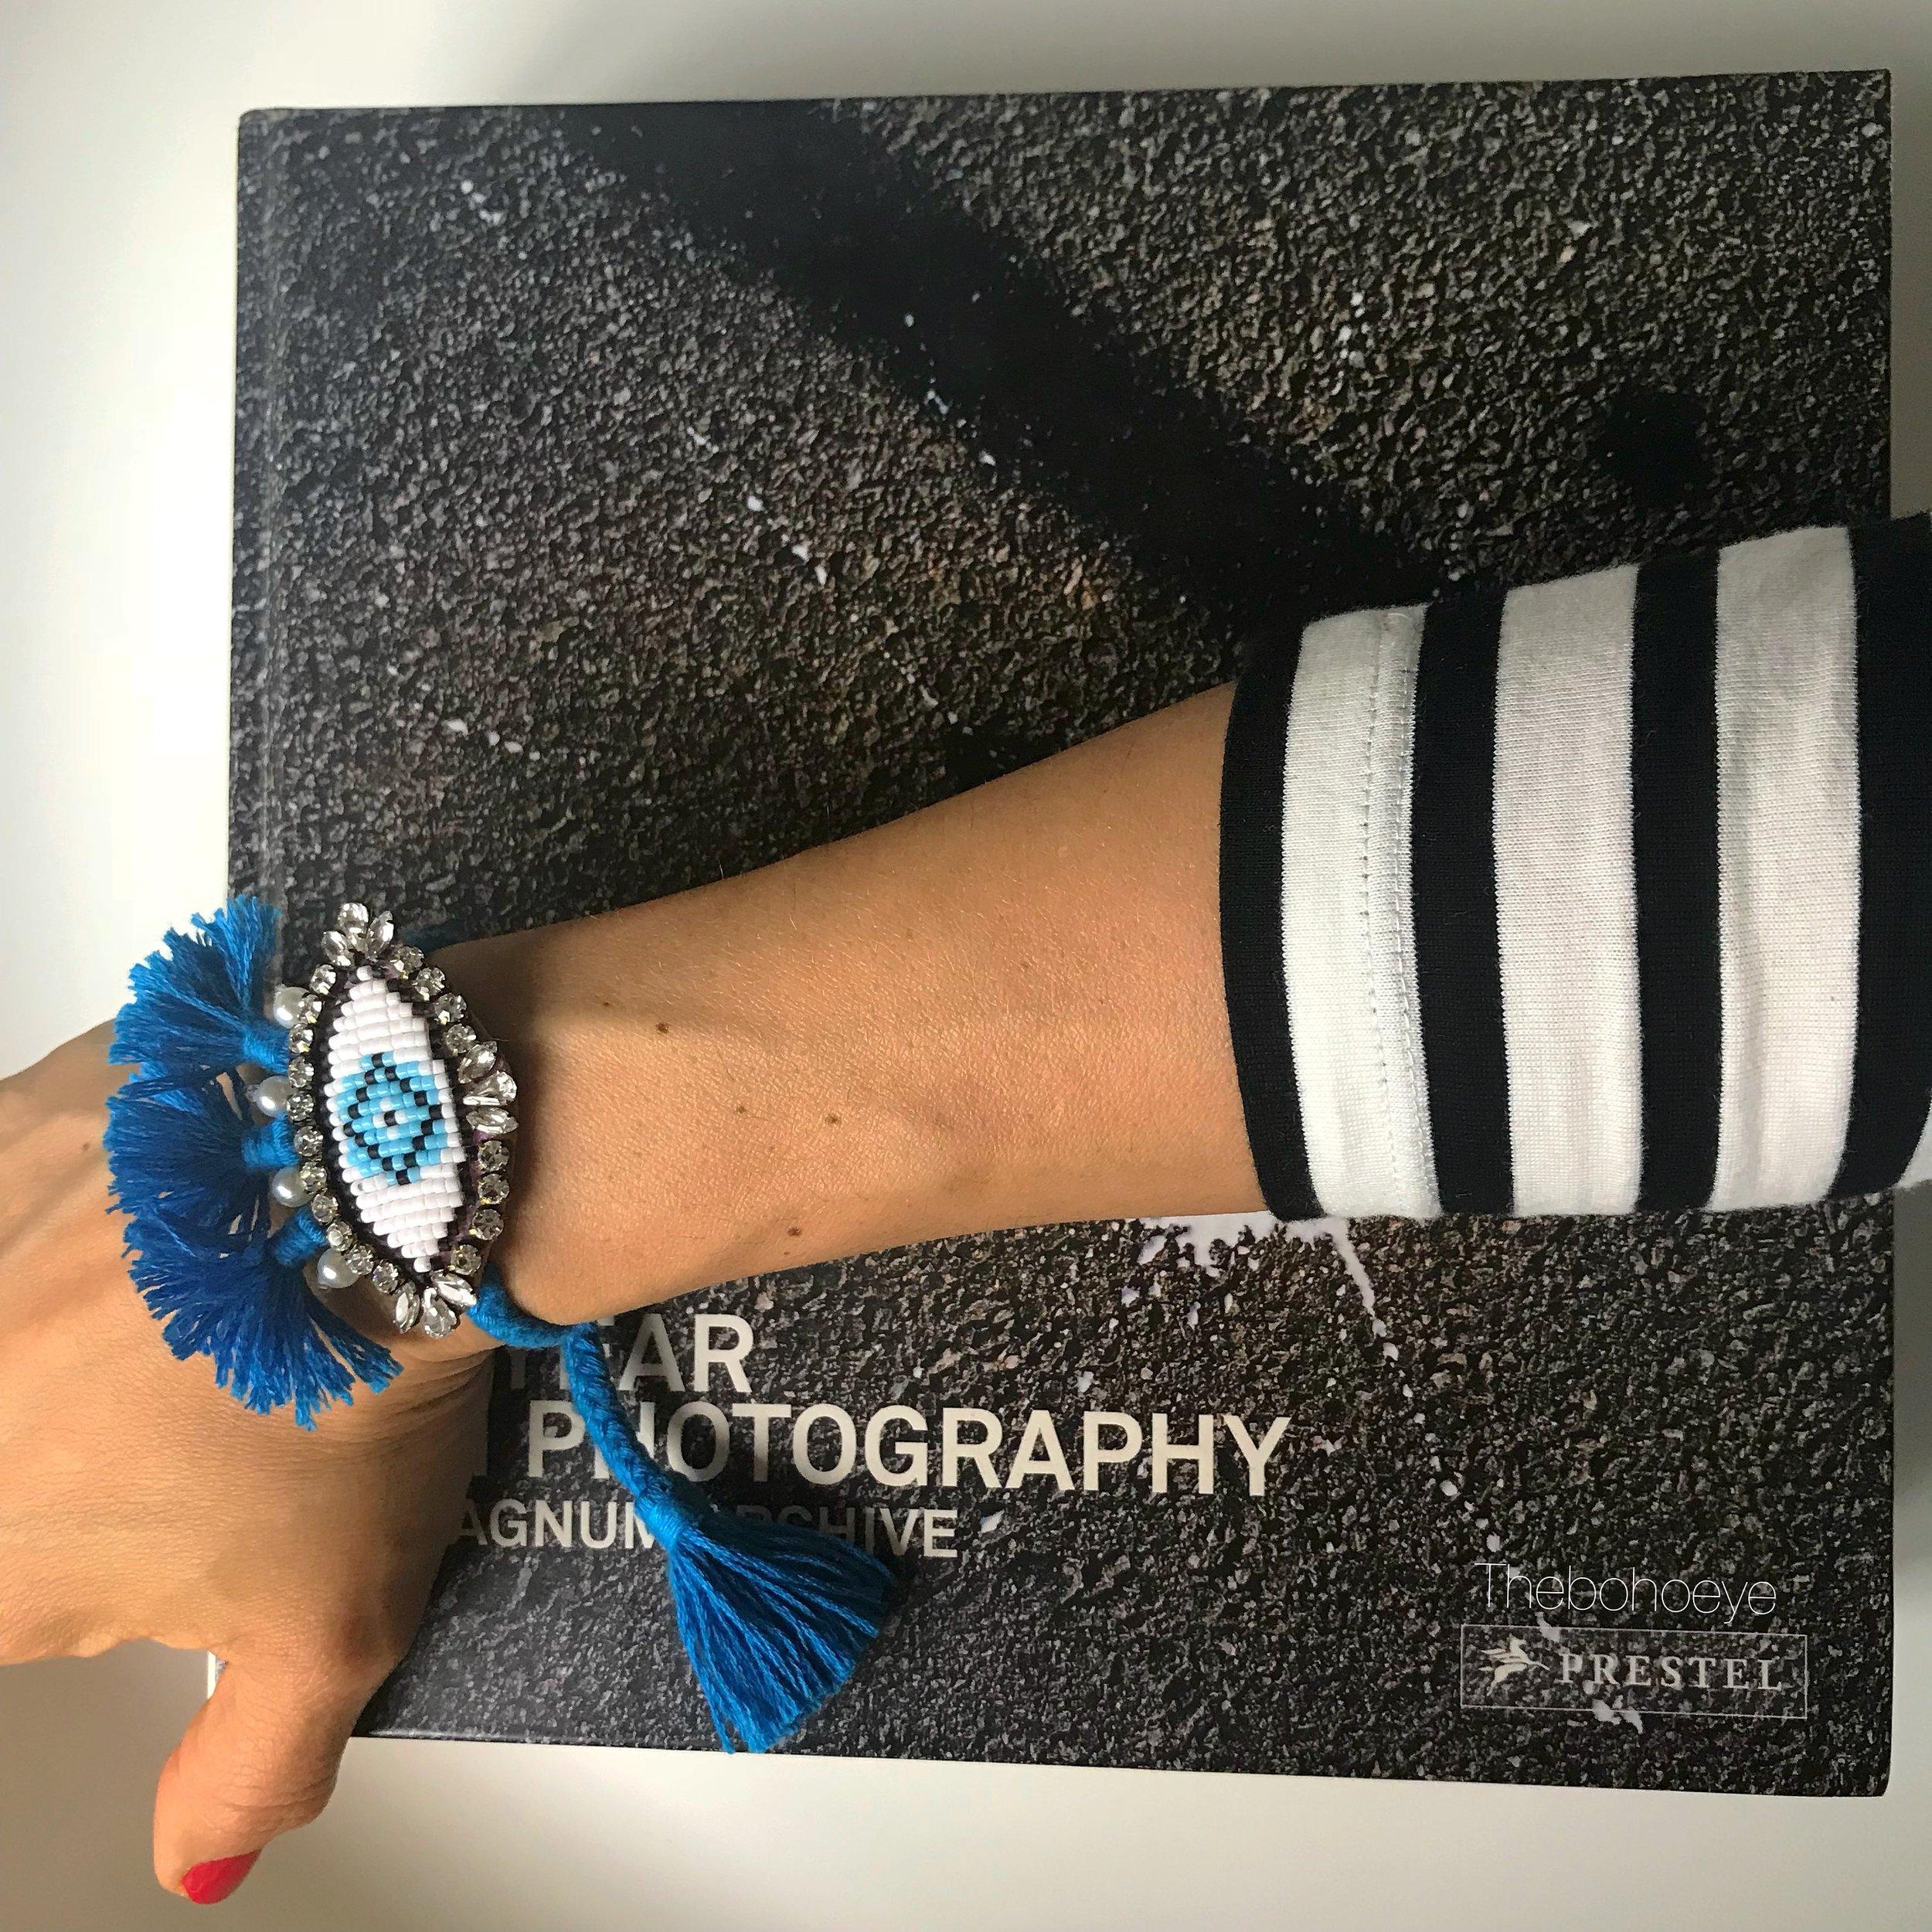 The Boho Eye - Handcrafted and trendy jewelry with a stylish international flair.https://www.instagram.com/bohoeye/